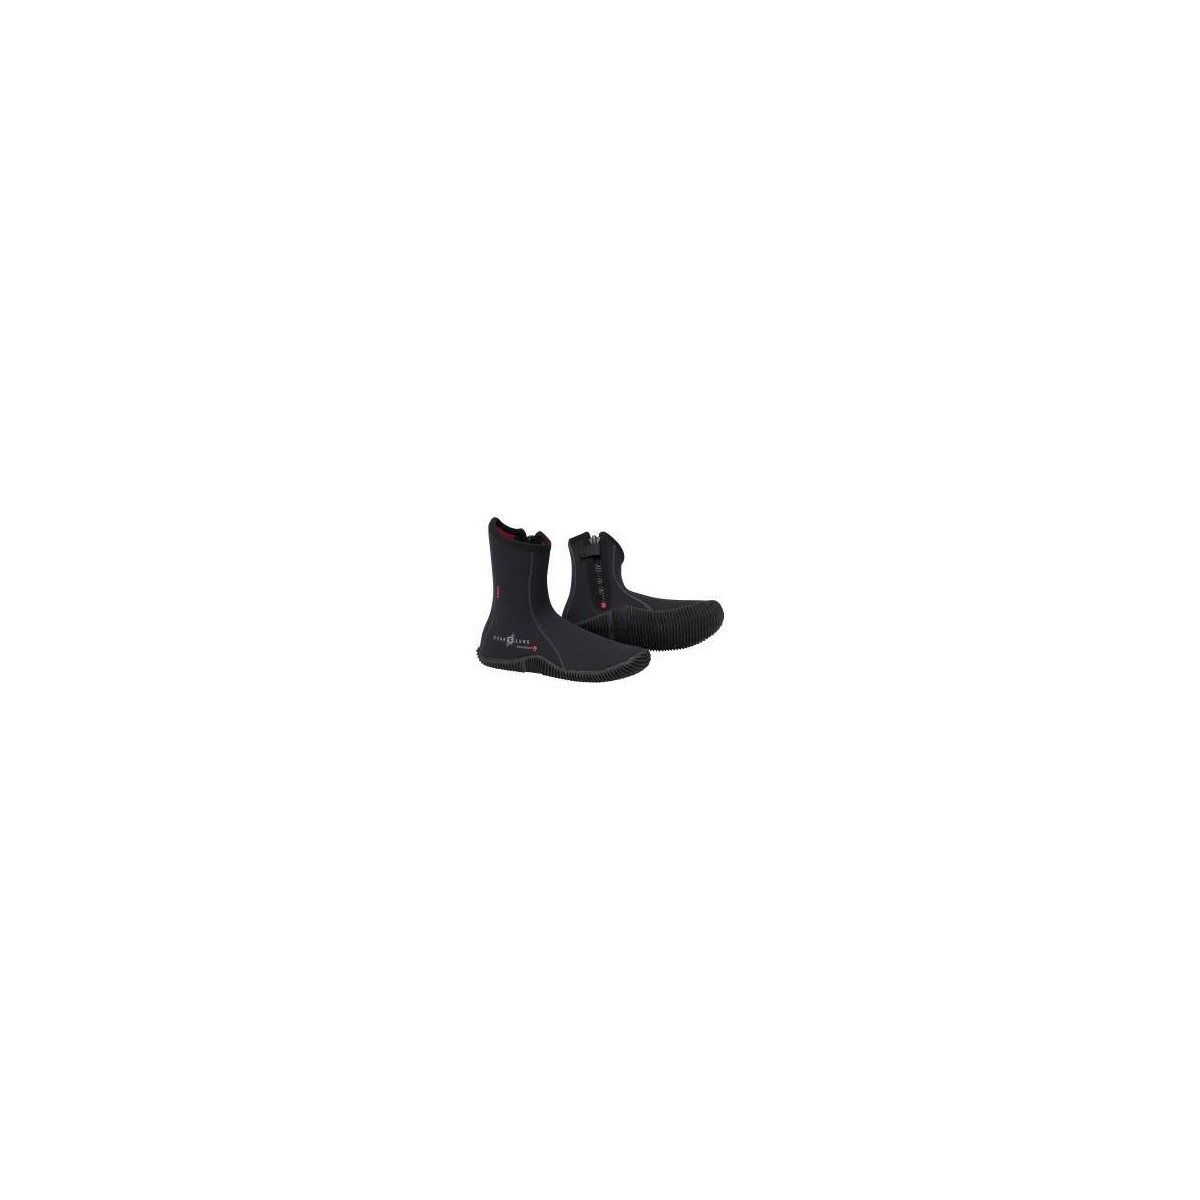 Aqua Lung Men's 6.5mm Echozip Ergo Boot